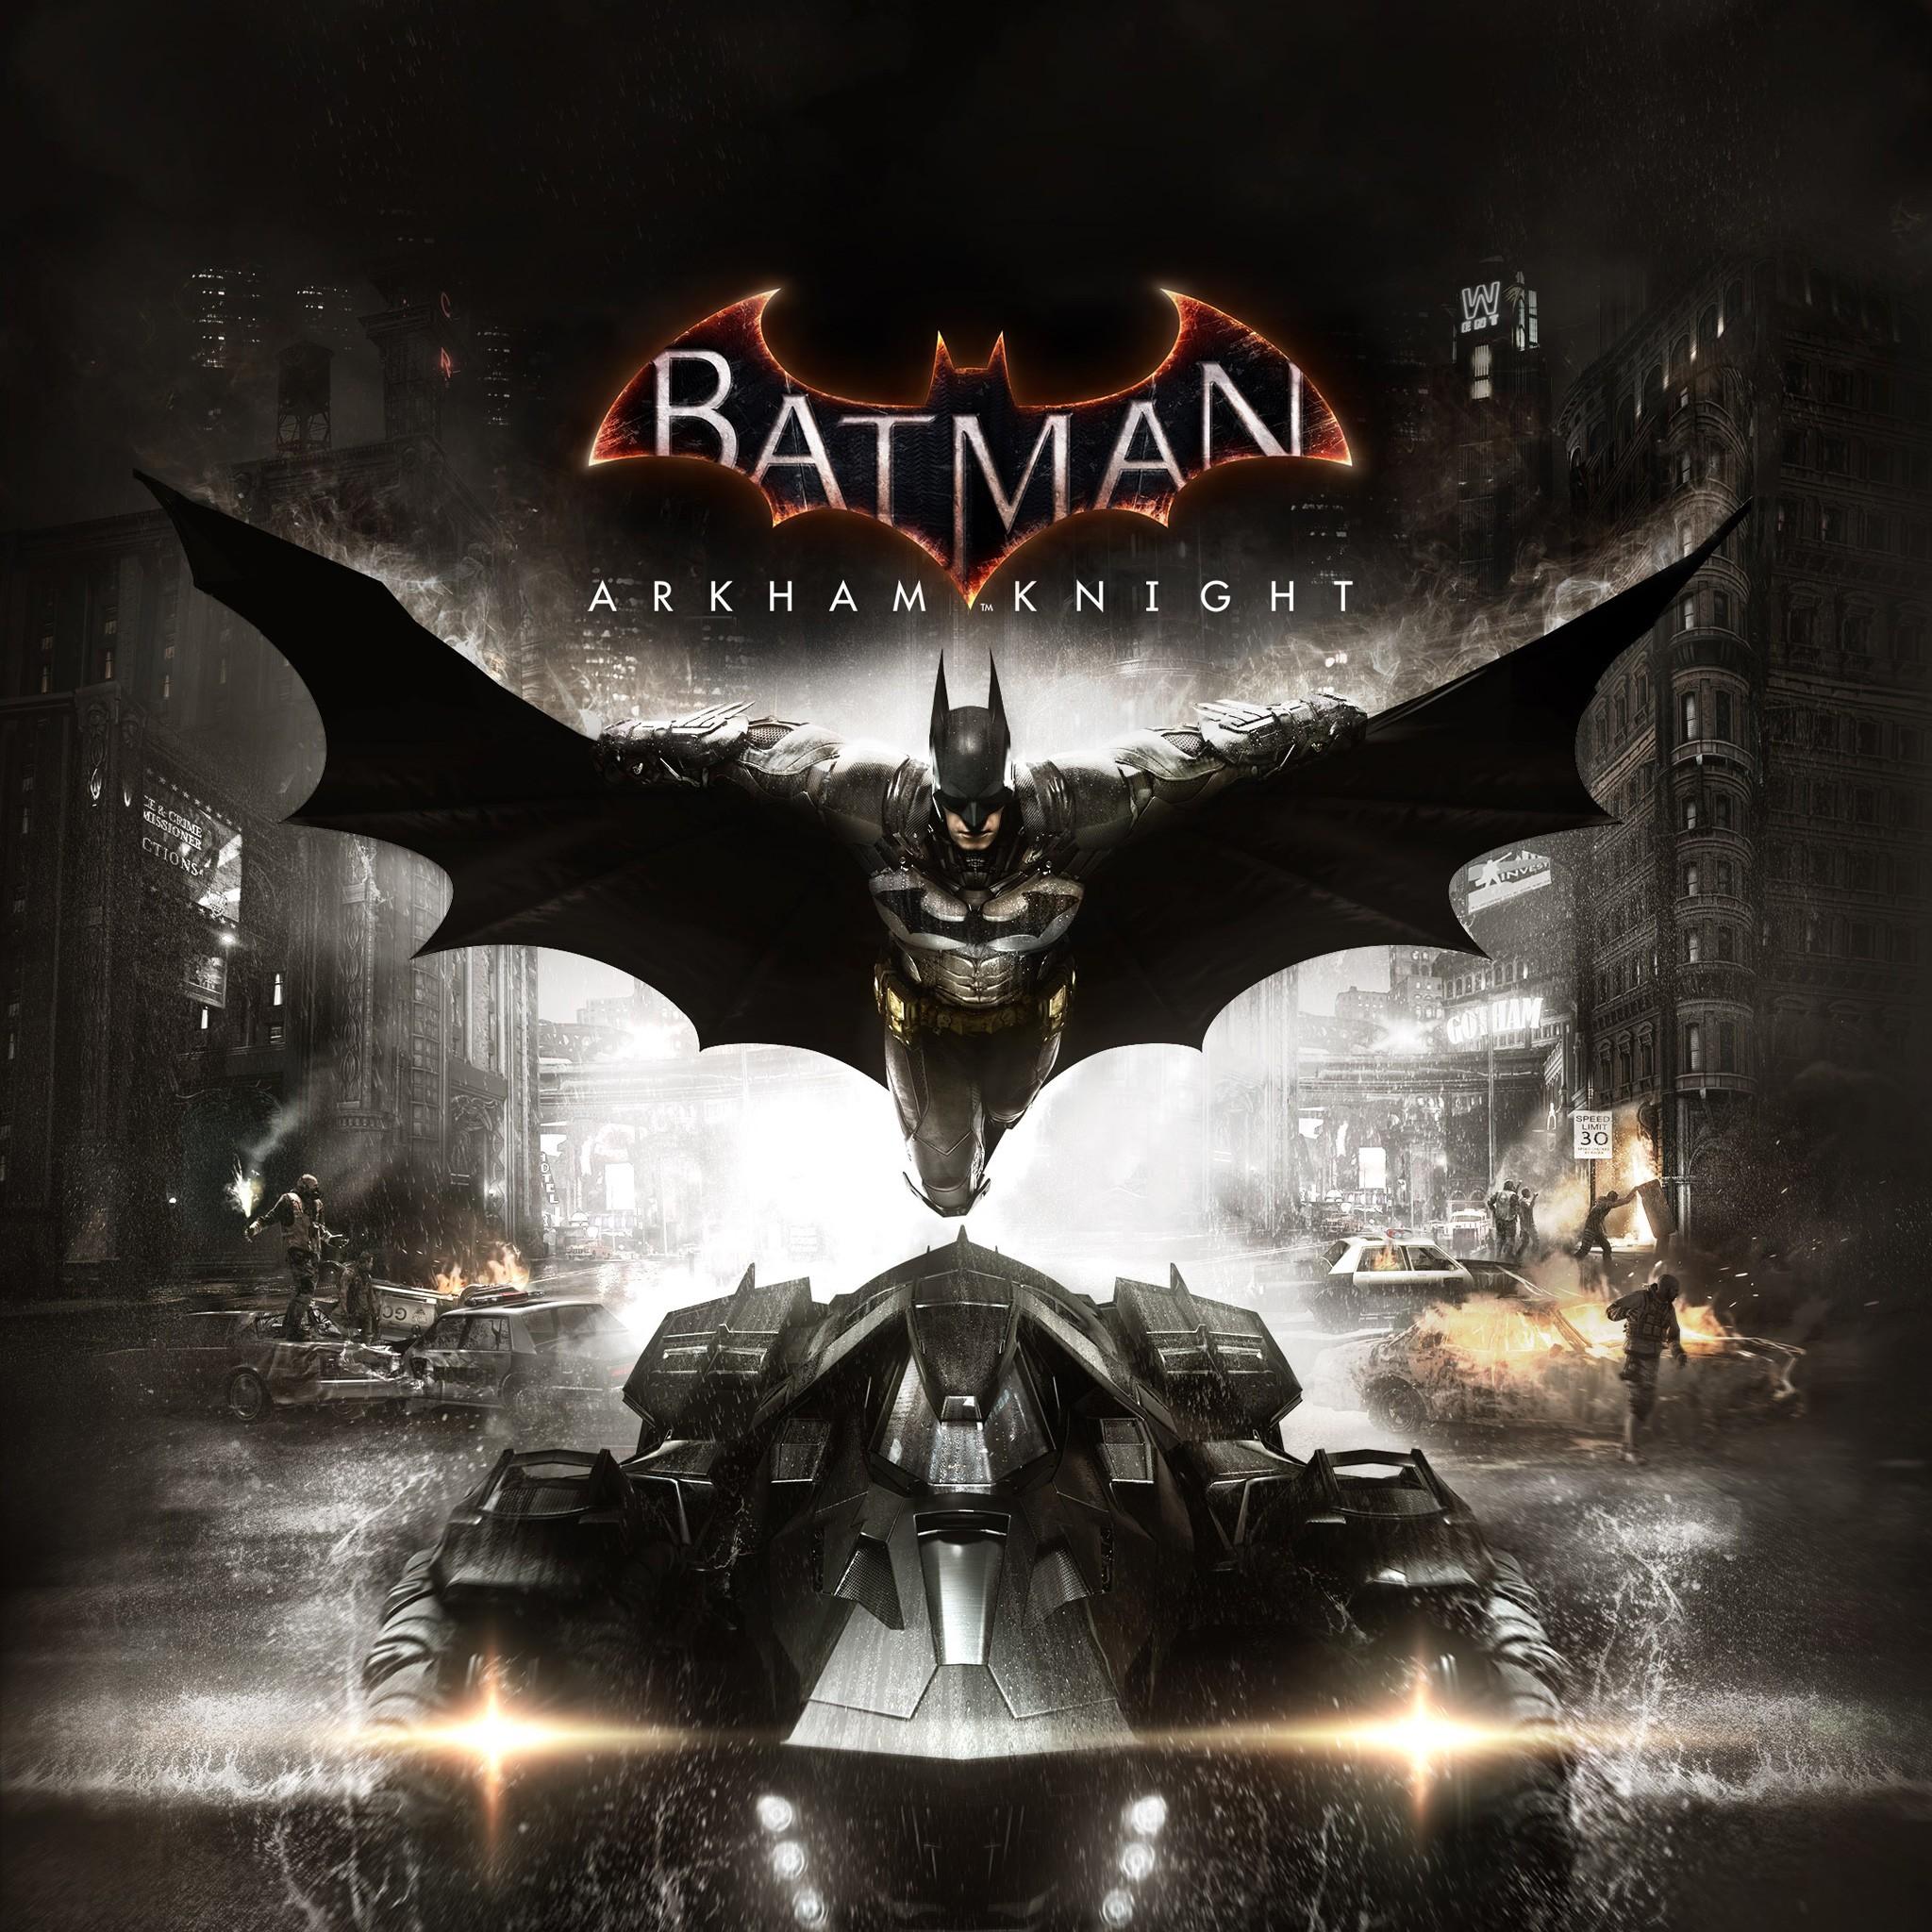 'Batman: Arkham Knight' trailer, box art, photos and more ...